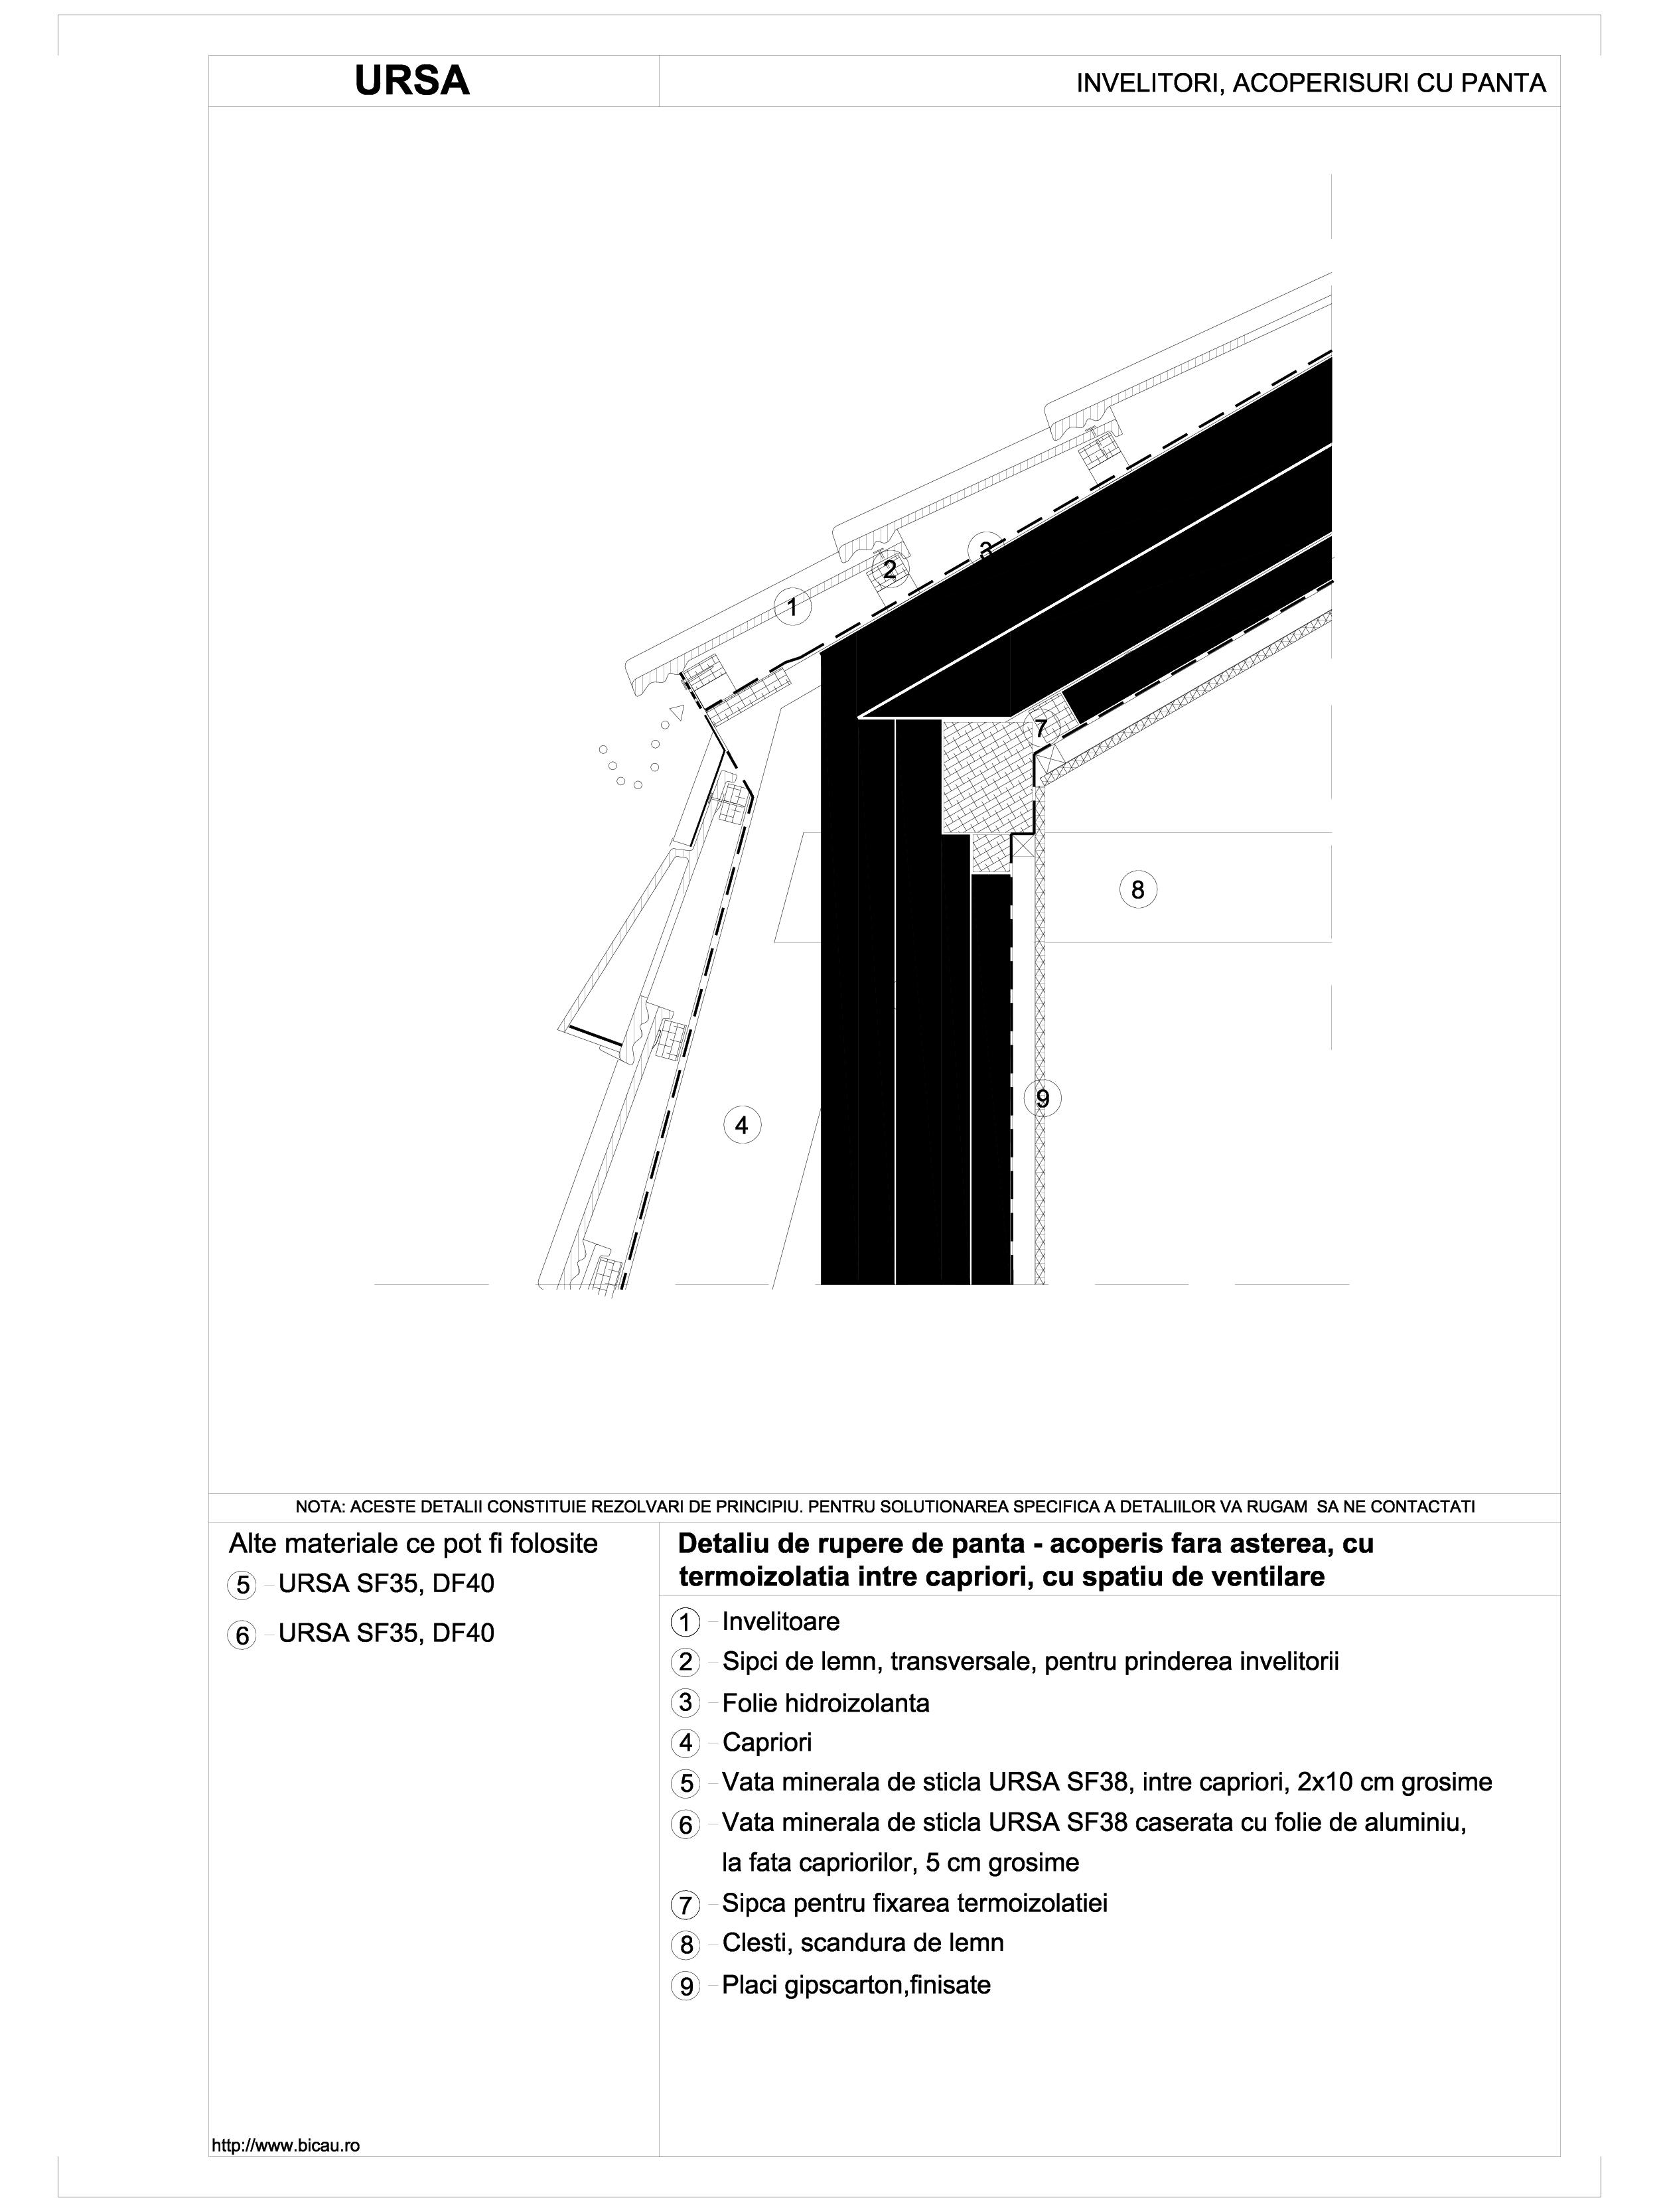 Pagina 1 - CAD-DWG Detaliu de rupere de panta - acoperis fara asterea, cu termoizolatia intre...